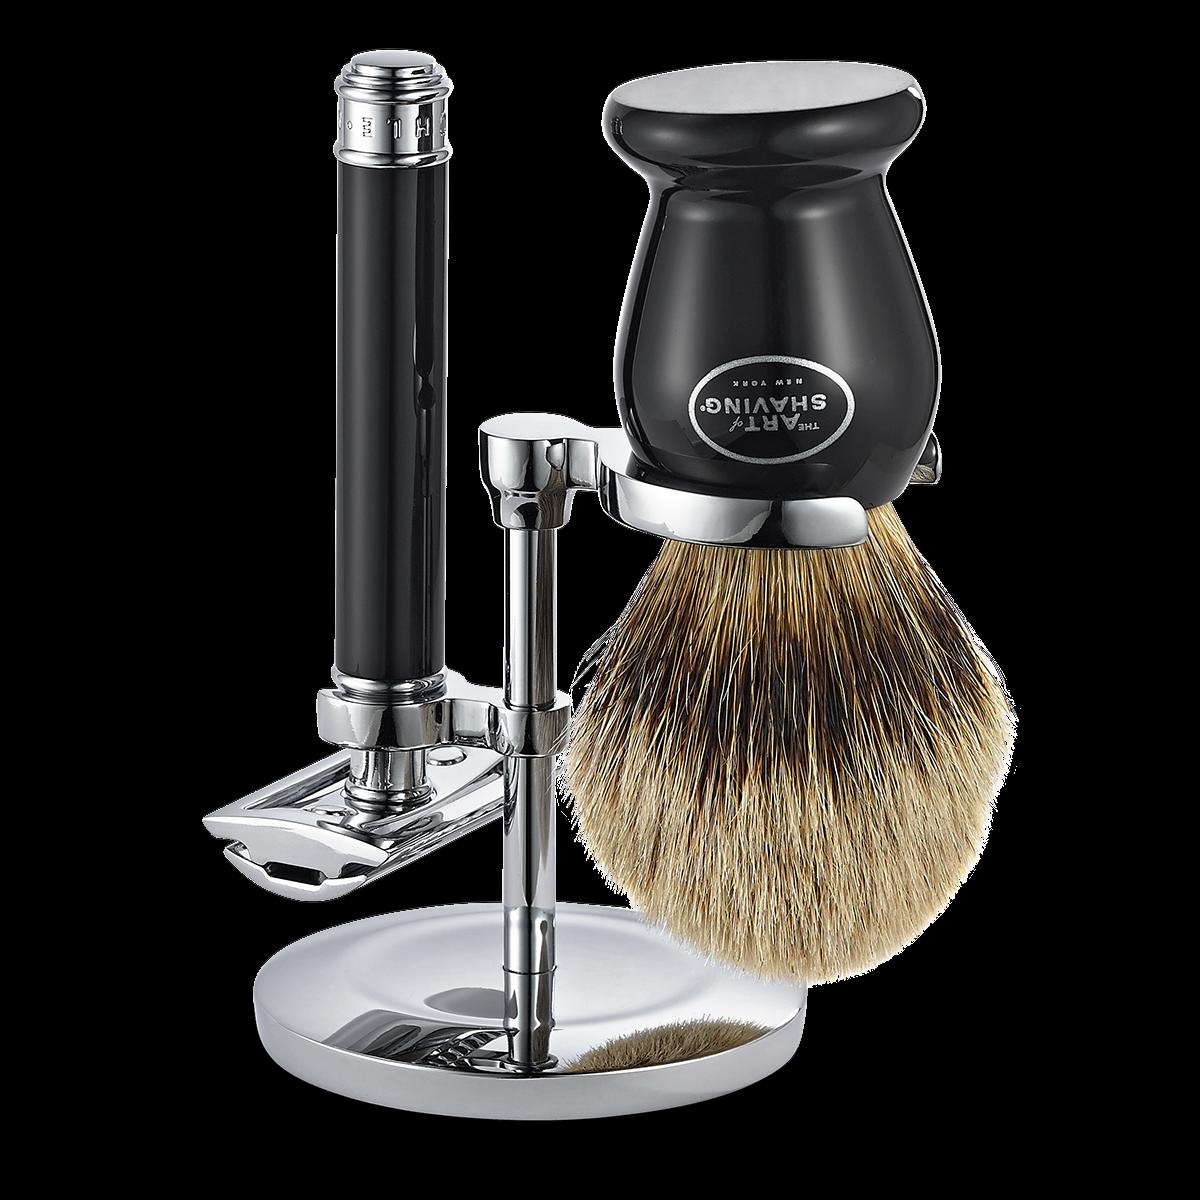 Safety Razor Shaving Stand Shaving stand, The art of